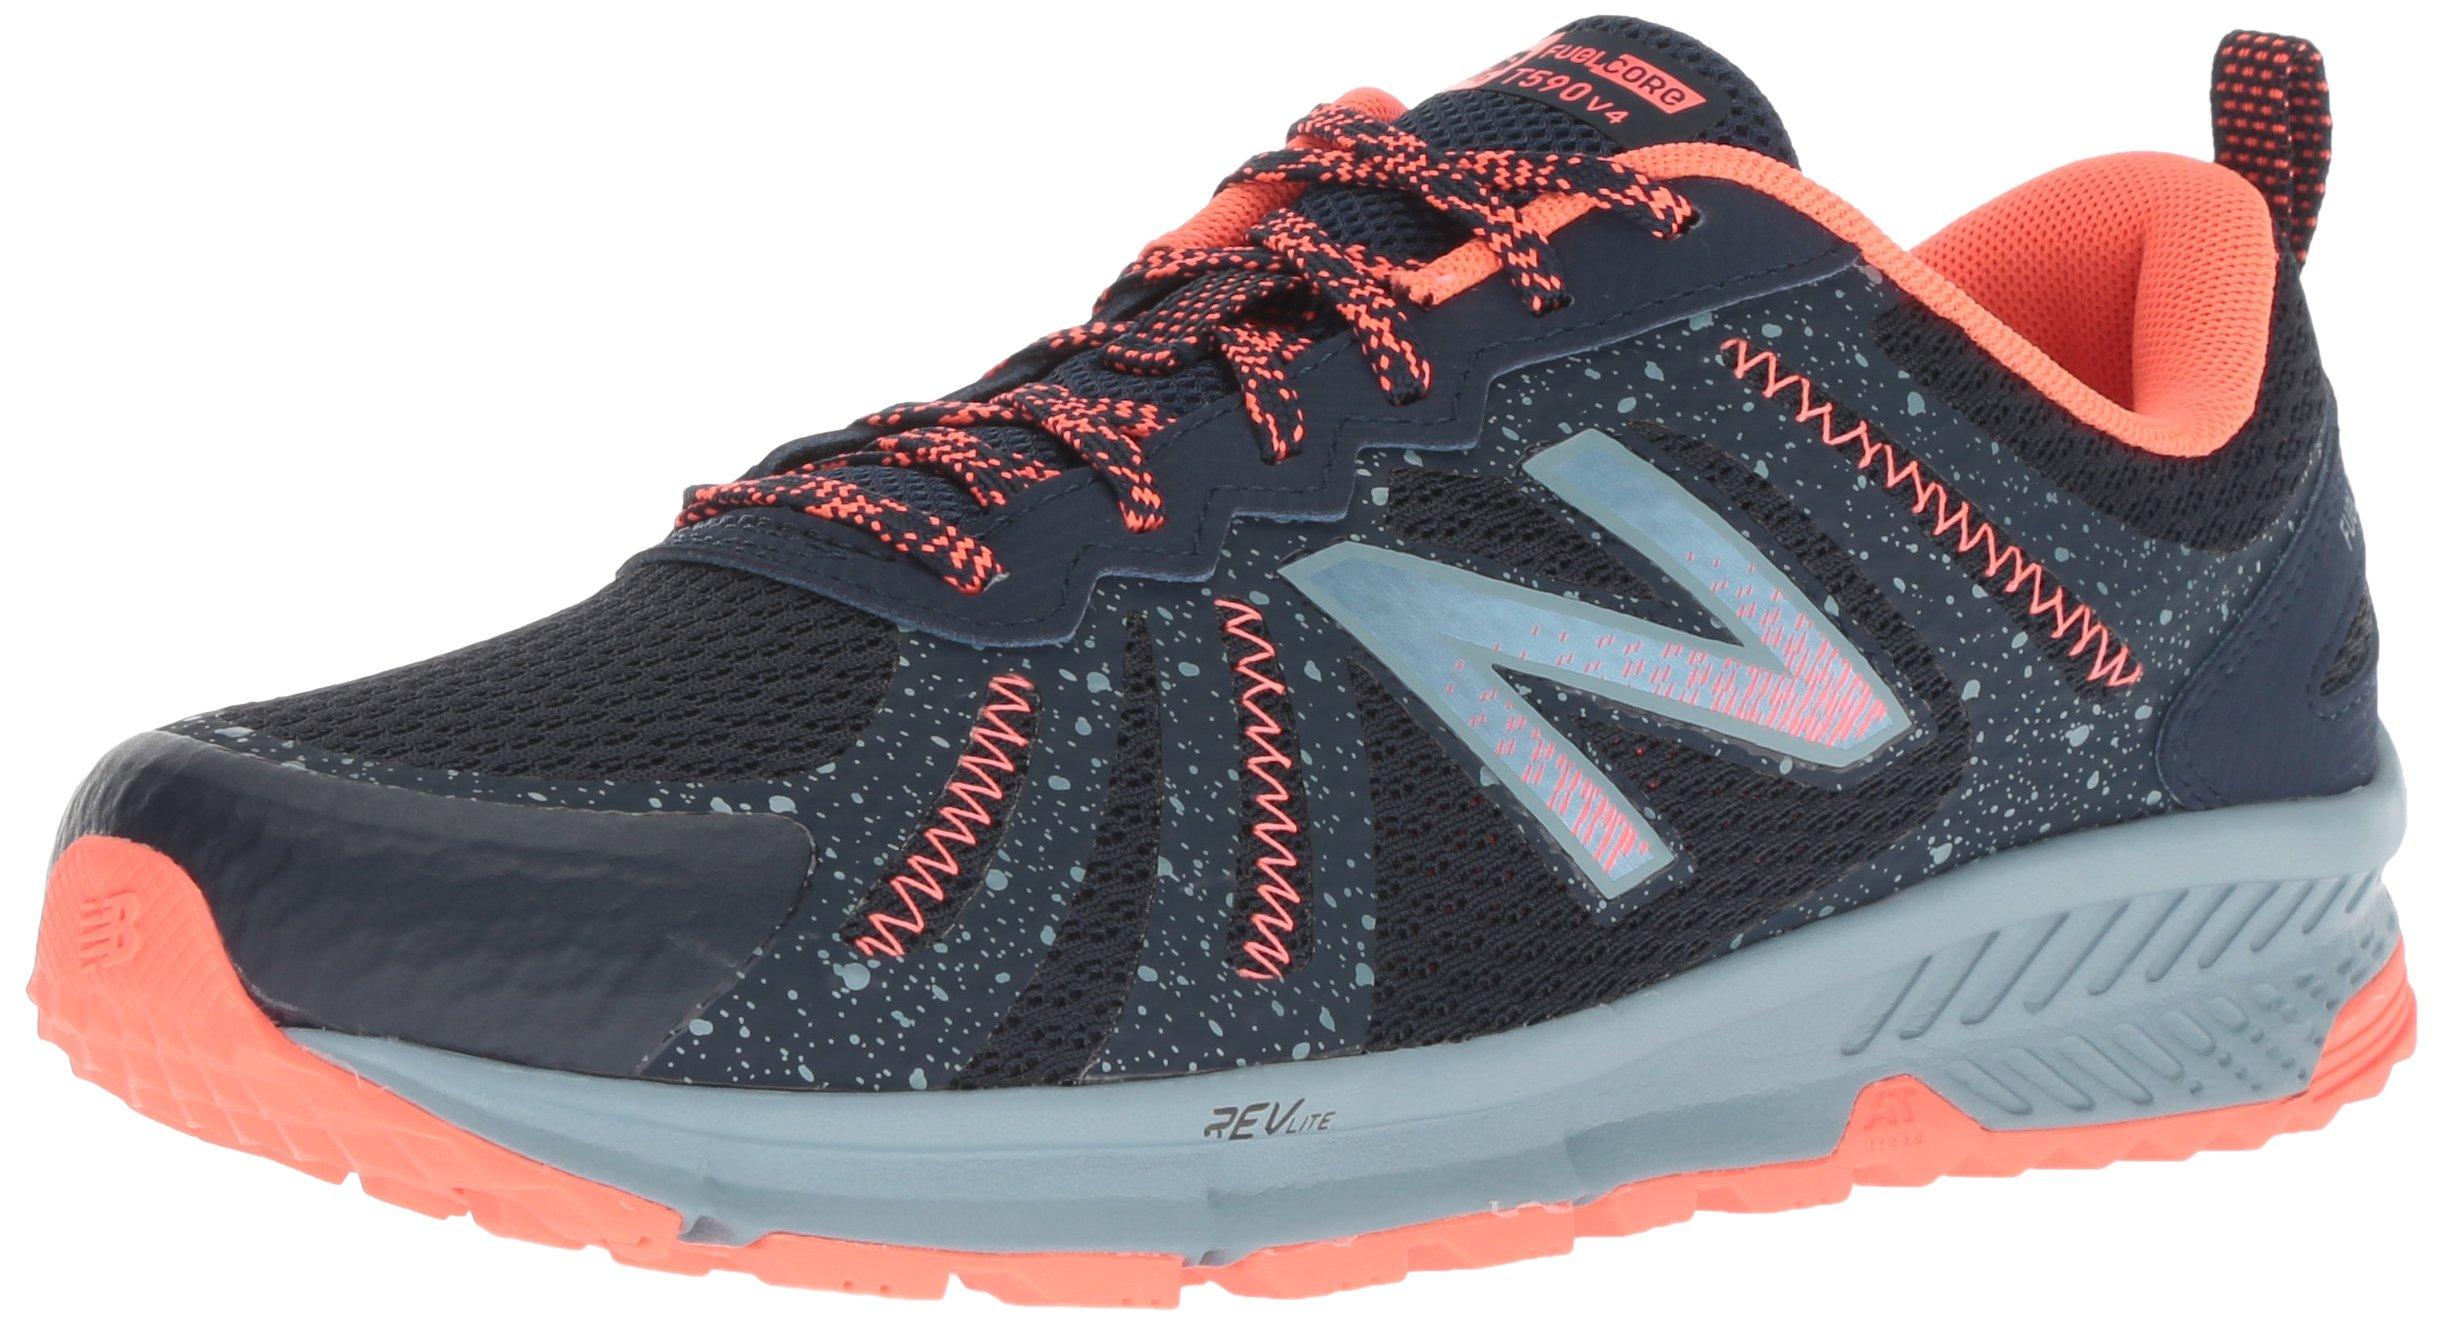 New Balance Women's 590v4 FuelCore Trail Running Shoe, Galaxy, 5 B US